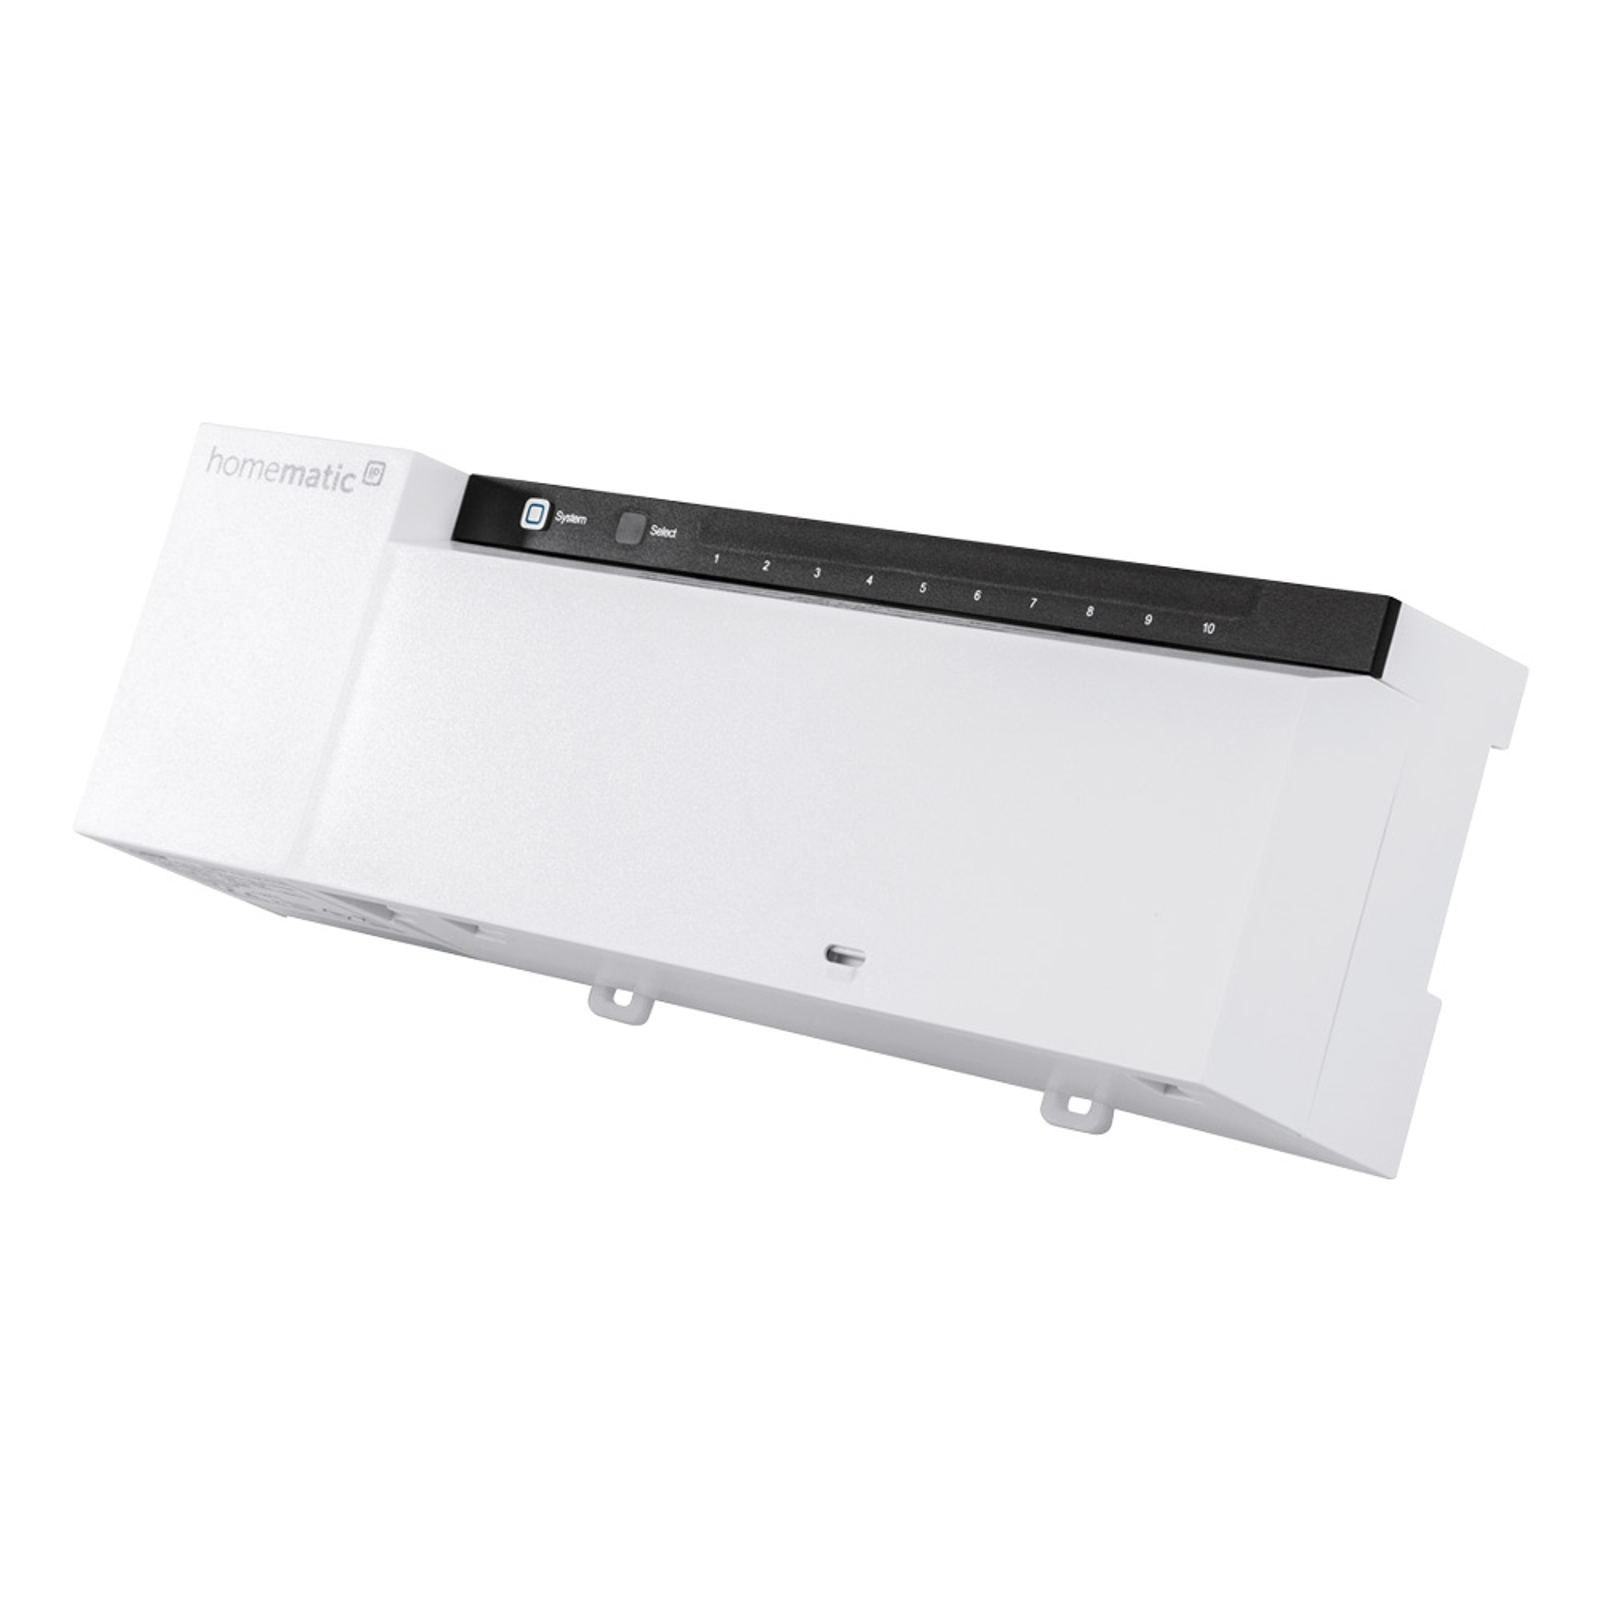 Homematic IP actionneur chauffage sol, 10x, 24V